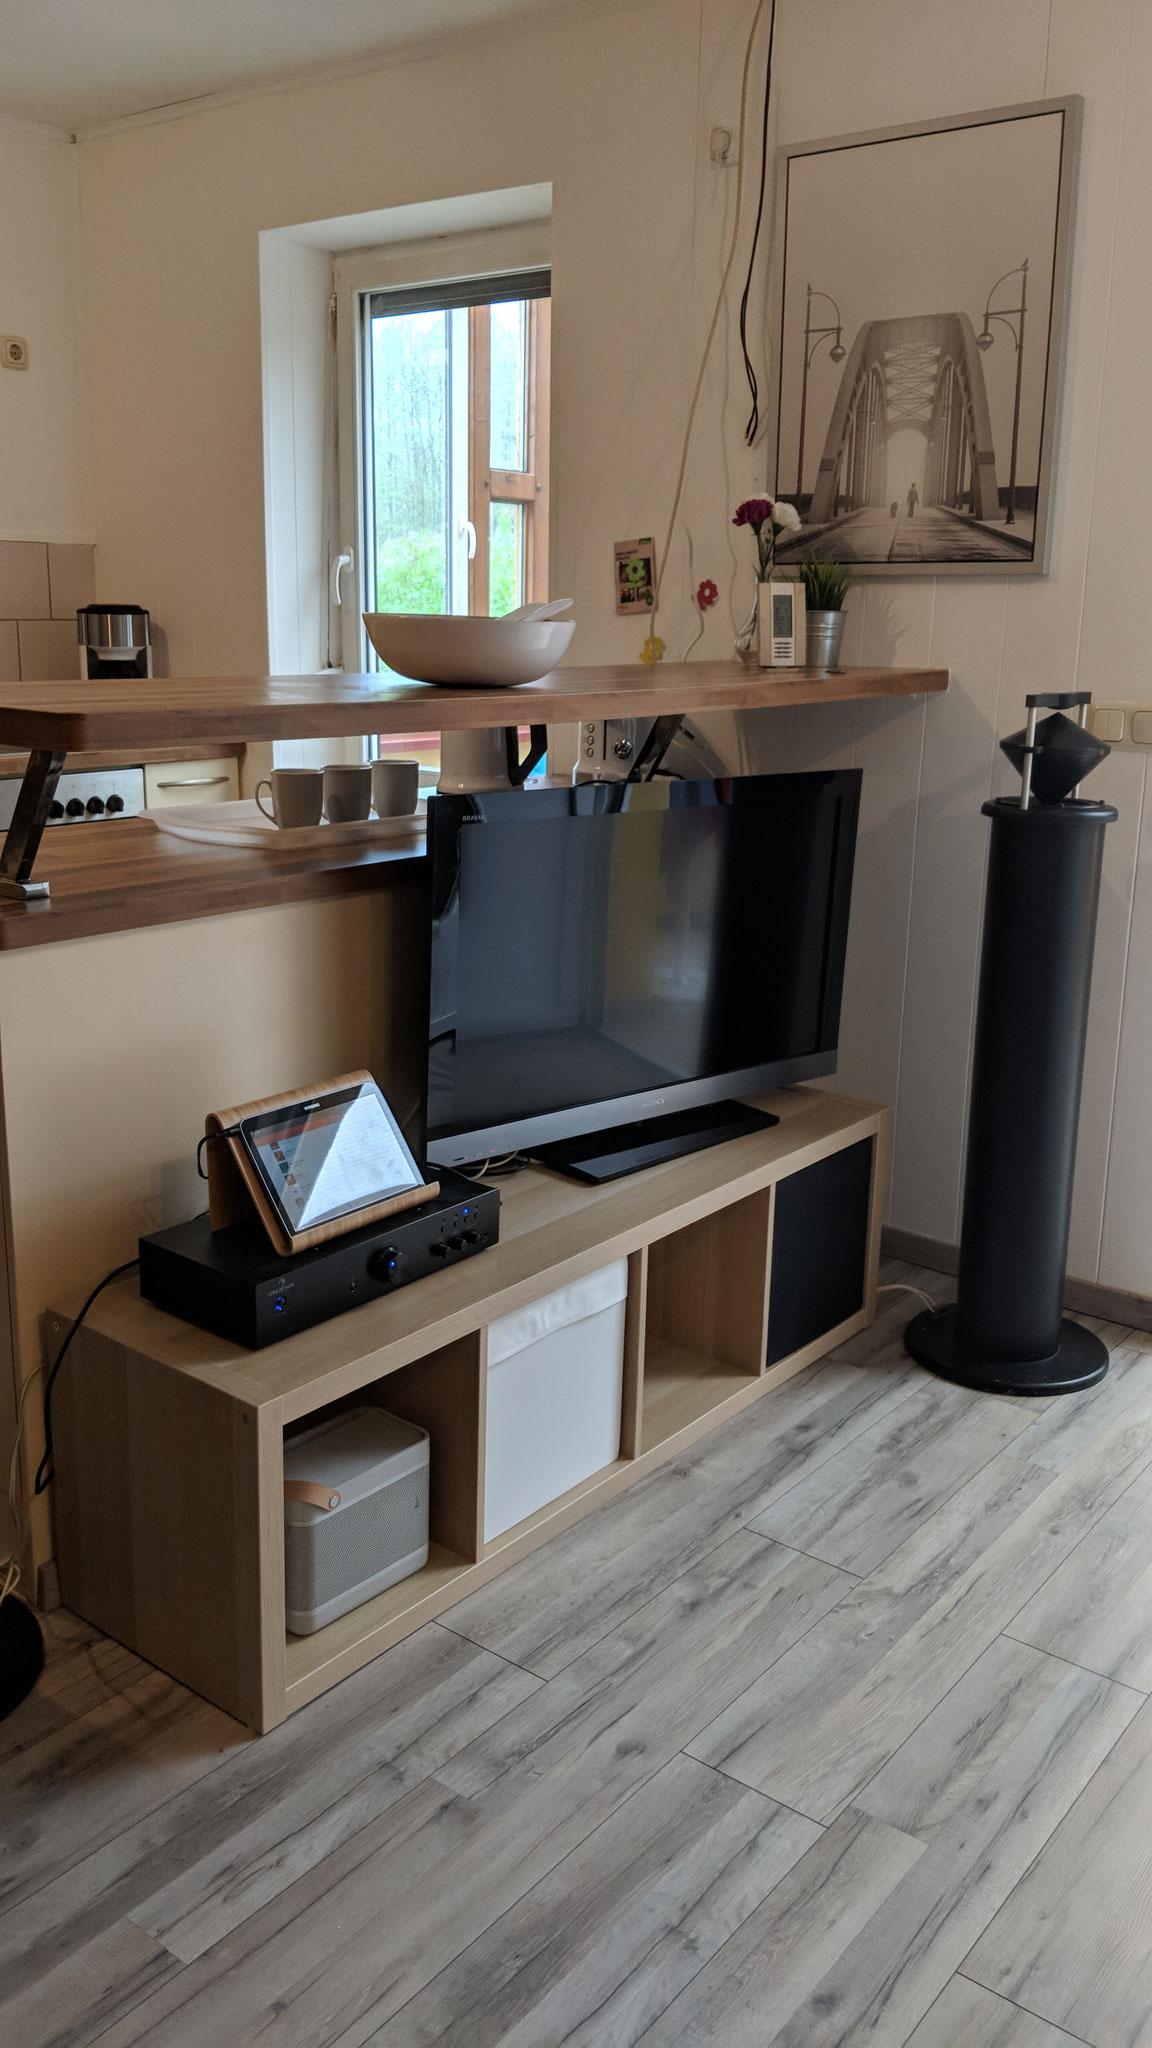 Ferienhaus Baalsee - SAT TV Schrank